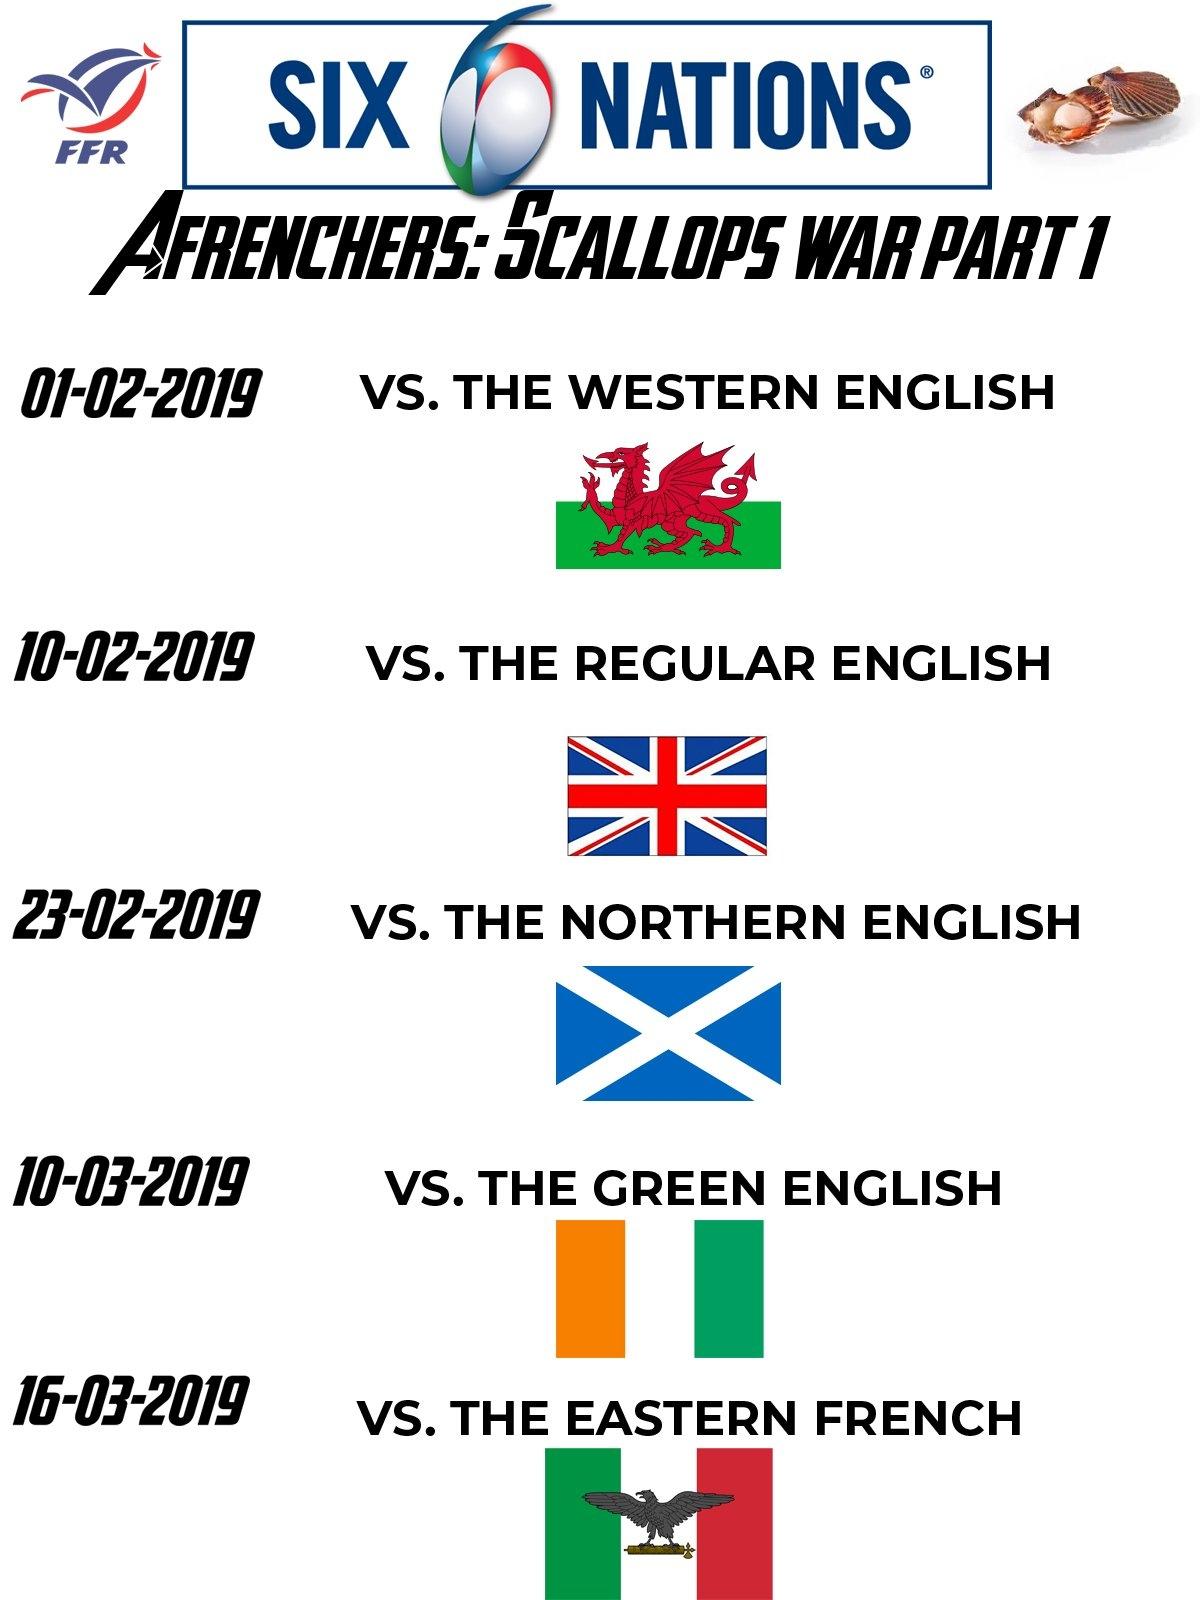 6 Nations Fixtures Calendar For France : Rugbyunion 6 Nations Calendar 2019